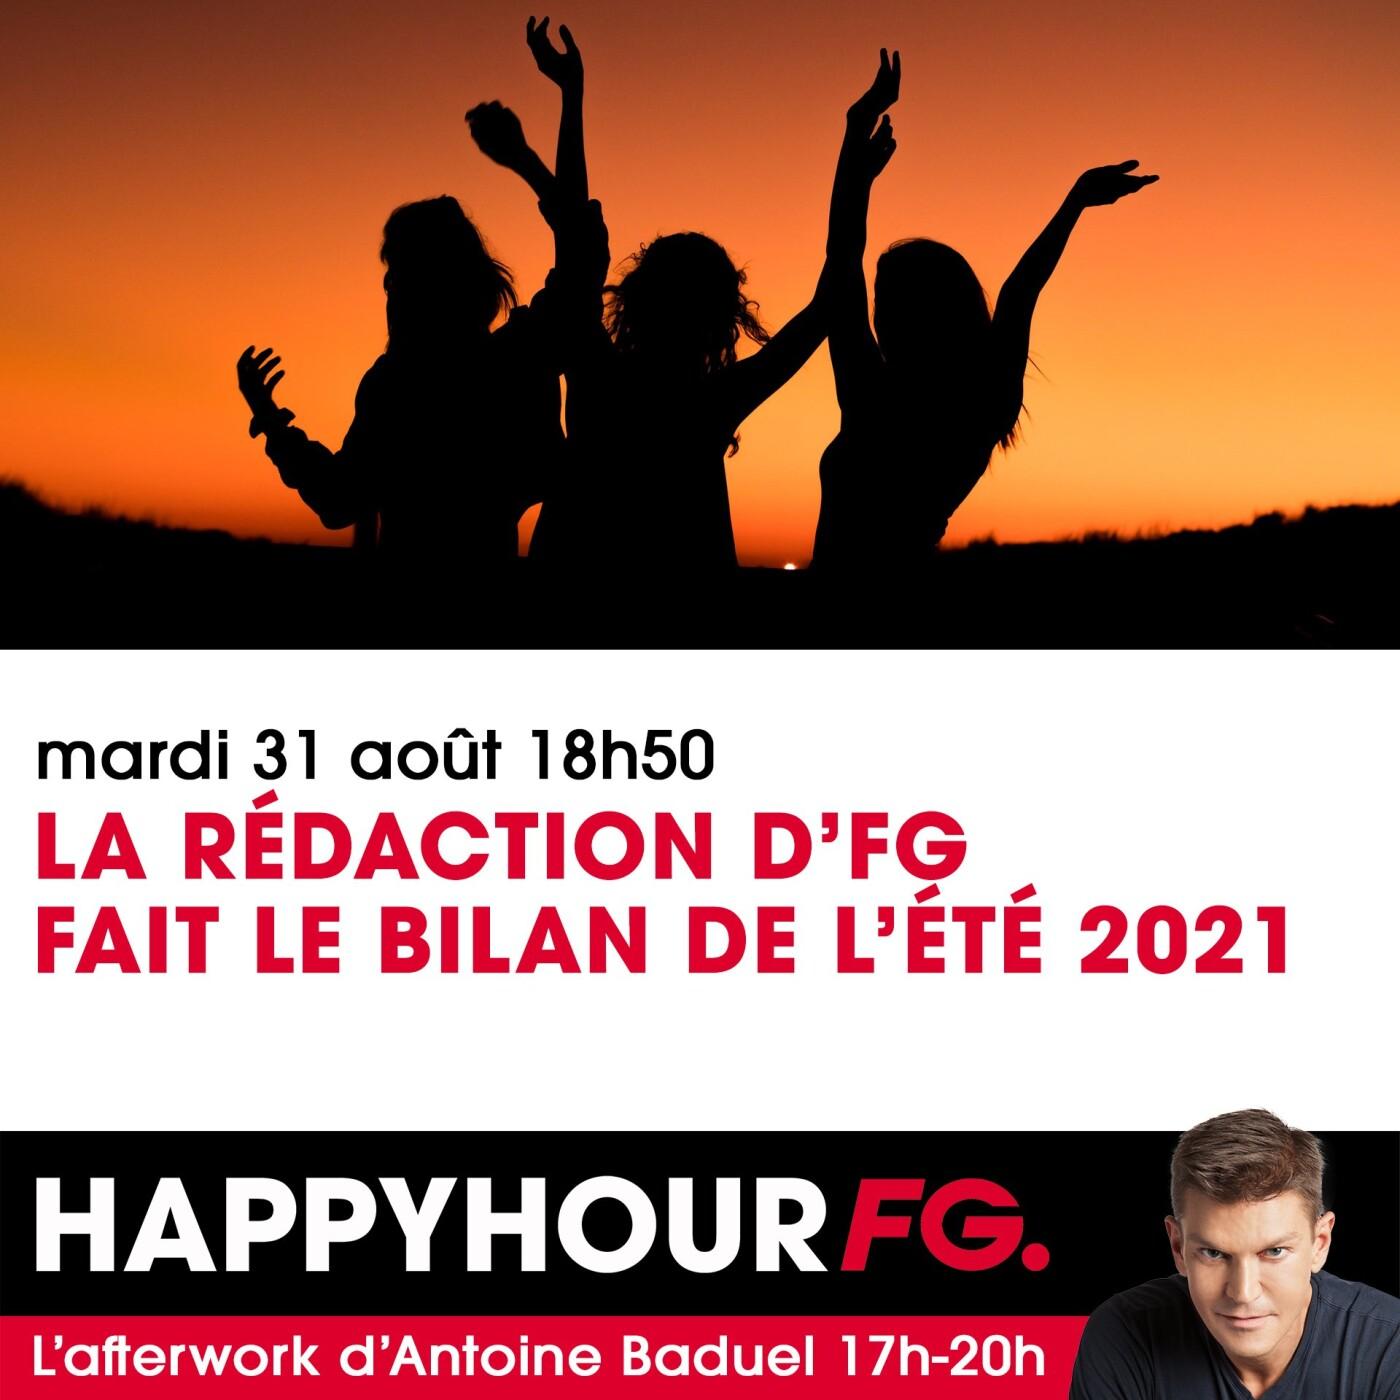 HAPPY HOUR INTERVIEW : BILAN ETE 2021